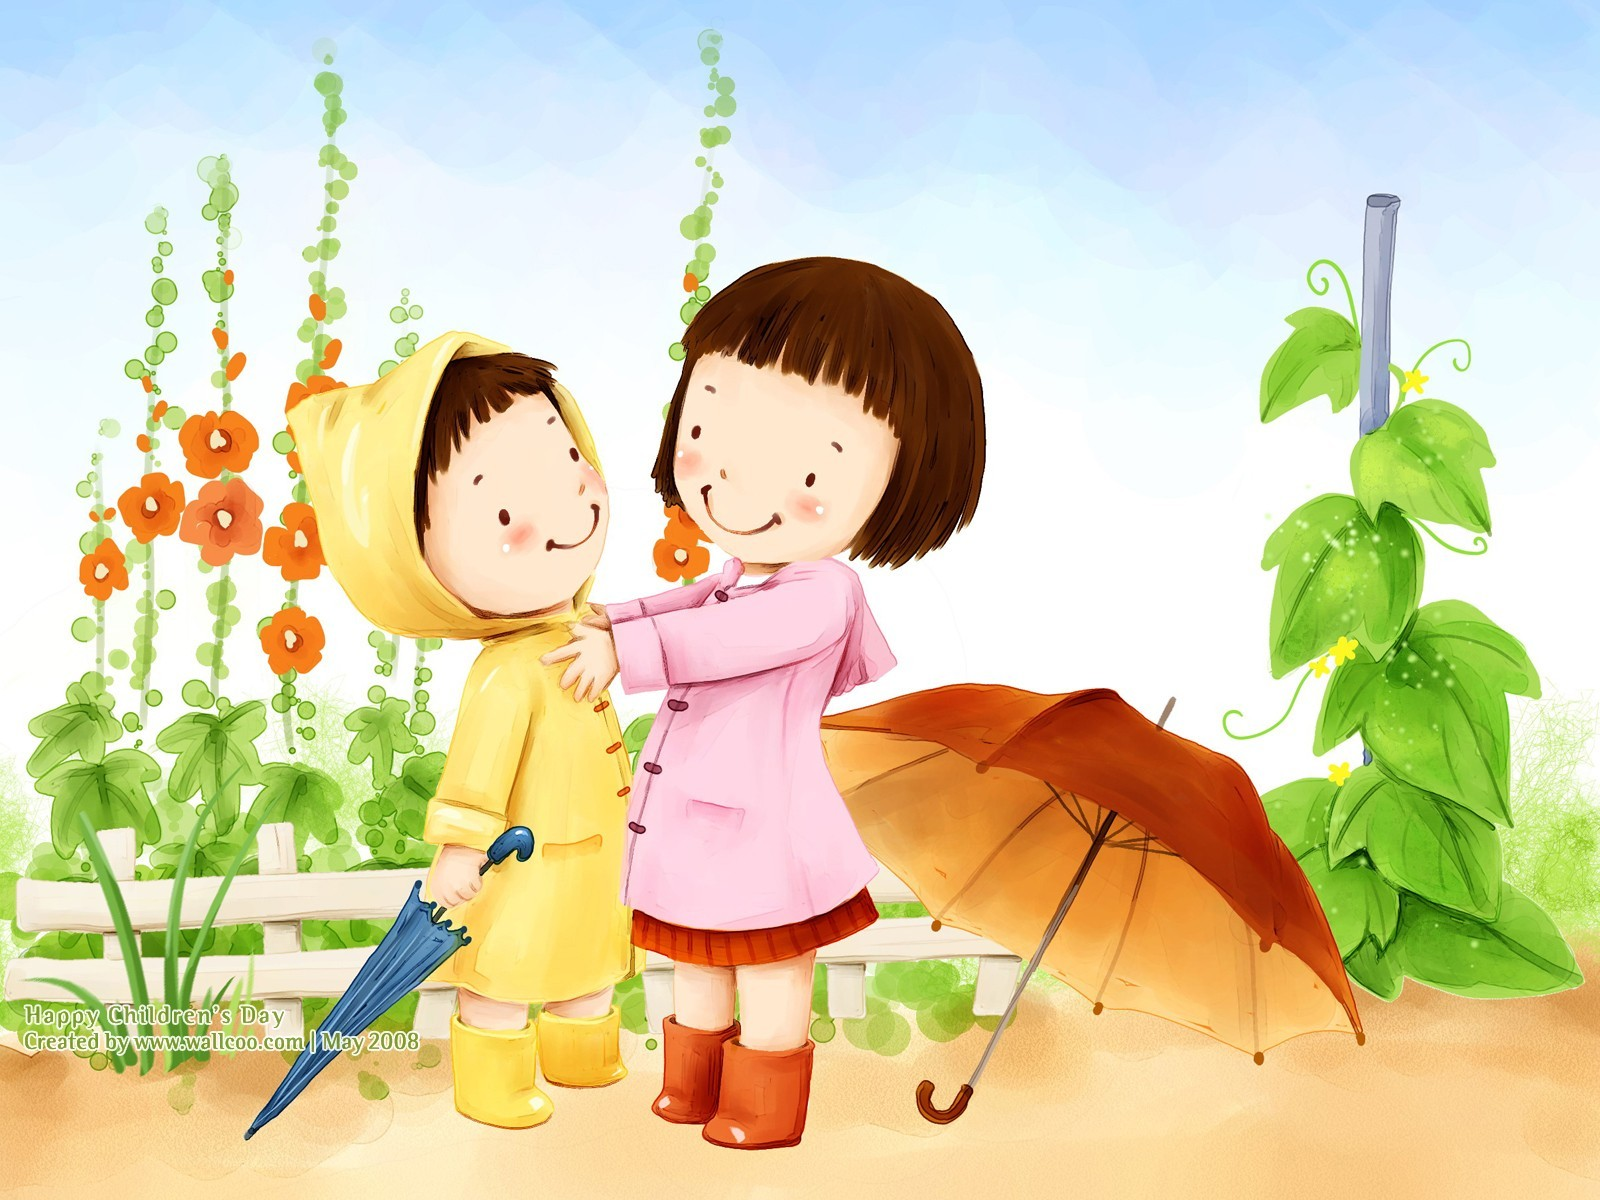 Childrens Day Wallpaper Greetings KidsFunDrawingArtCartoon 1600x1200